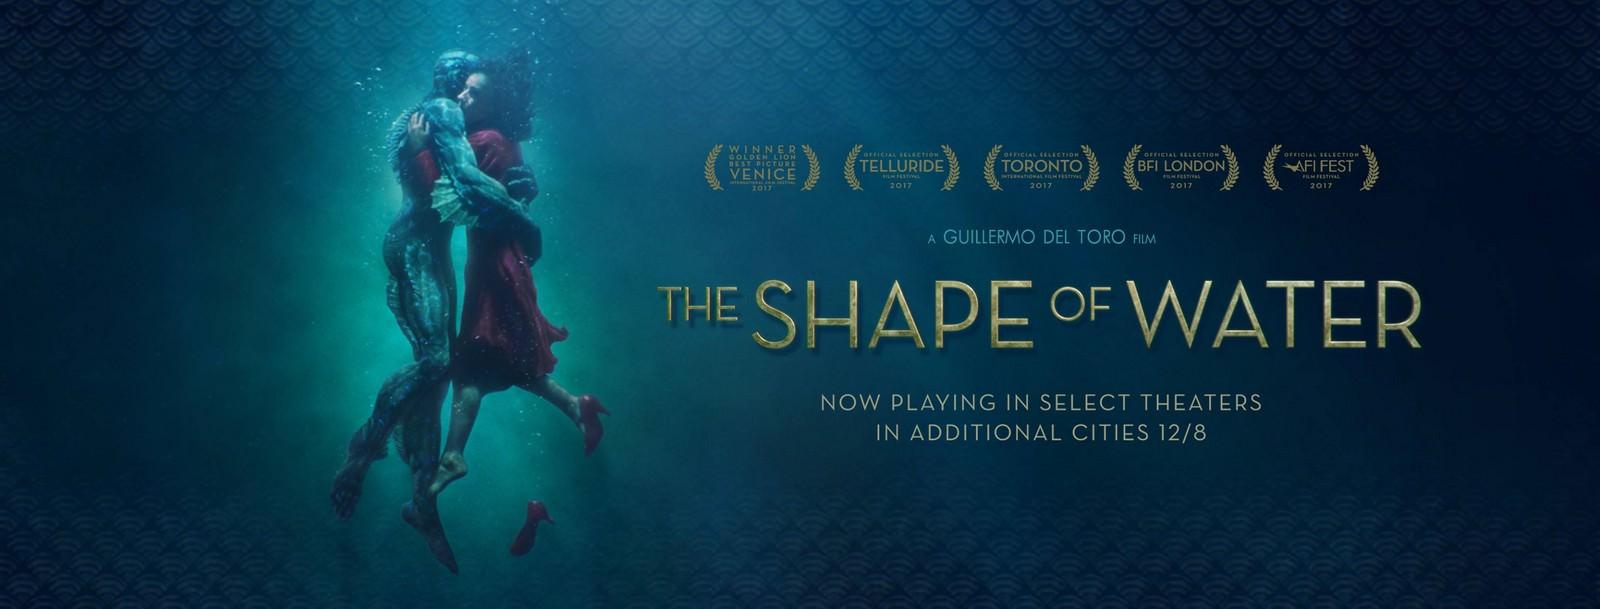 Movie, The Shape of Water(美國) / 水底情深(台) / 忘形水(港) / 水形物语(網), 電影海報, 美國, 橫版